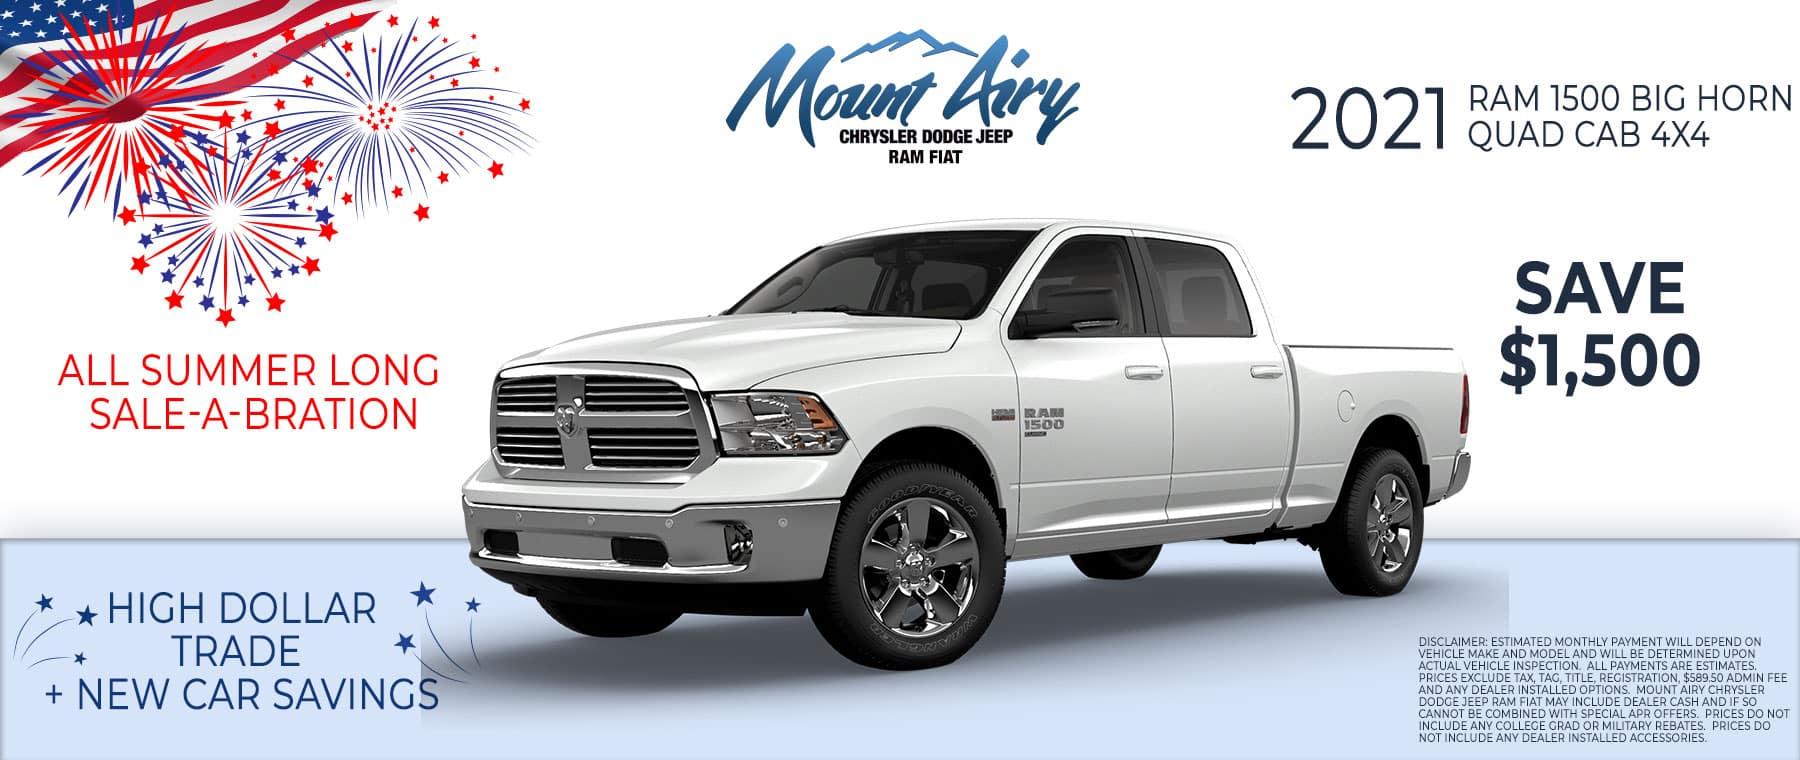 2021 Ram 1500 Mount Airy